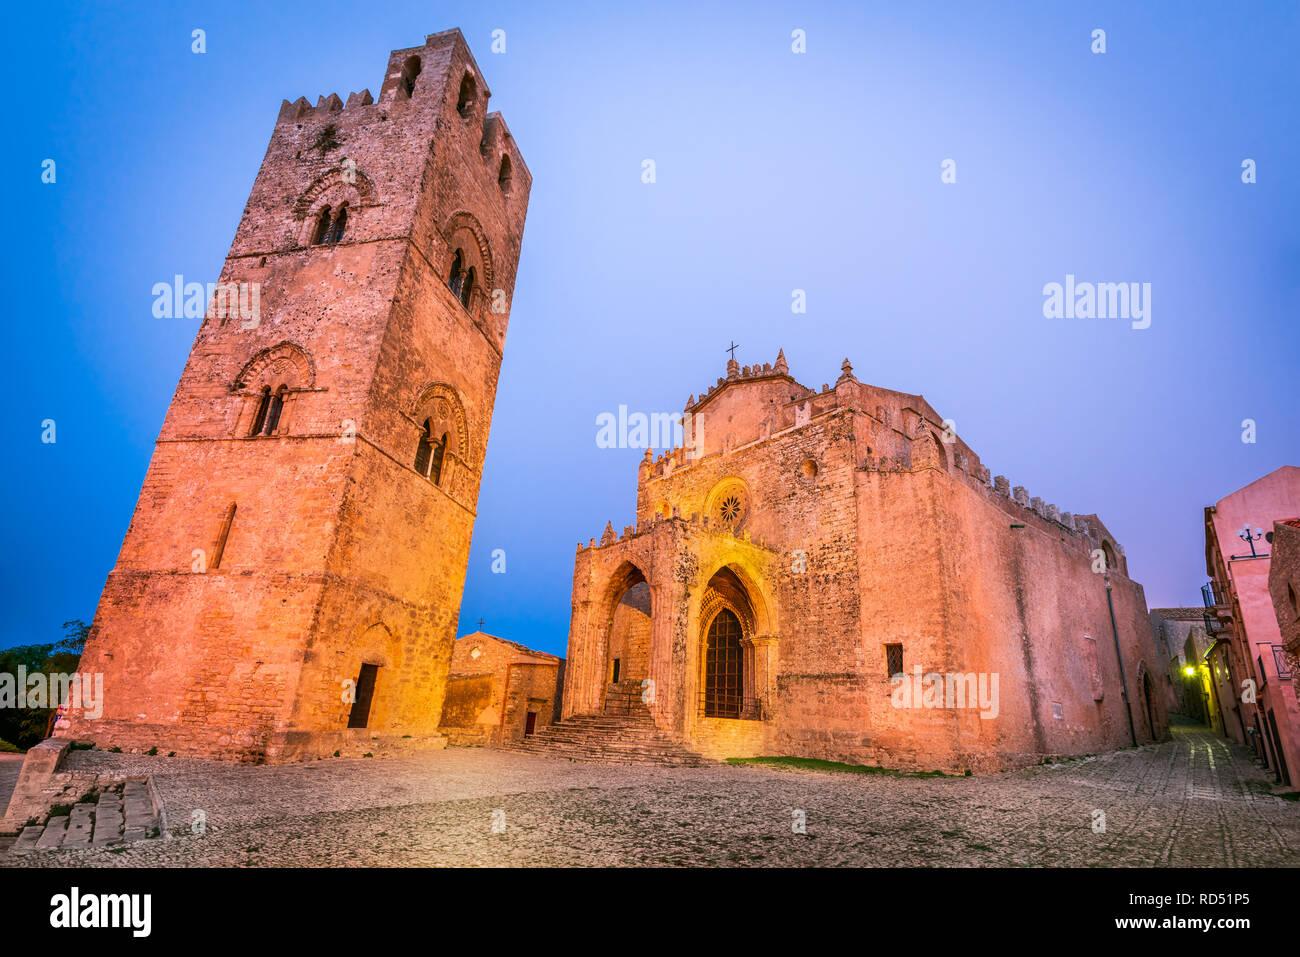 Erice, Sicily. Chiesa Madre, Duomo Assunta main church of medieval stonewalled city Erix, Italy. - Stock Image